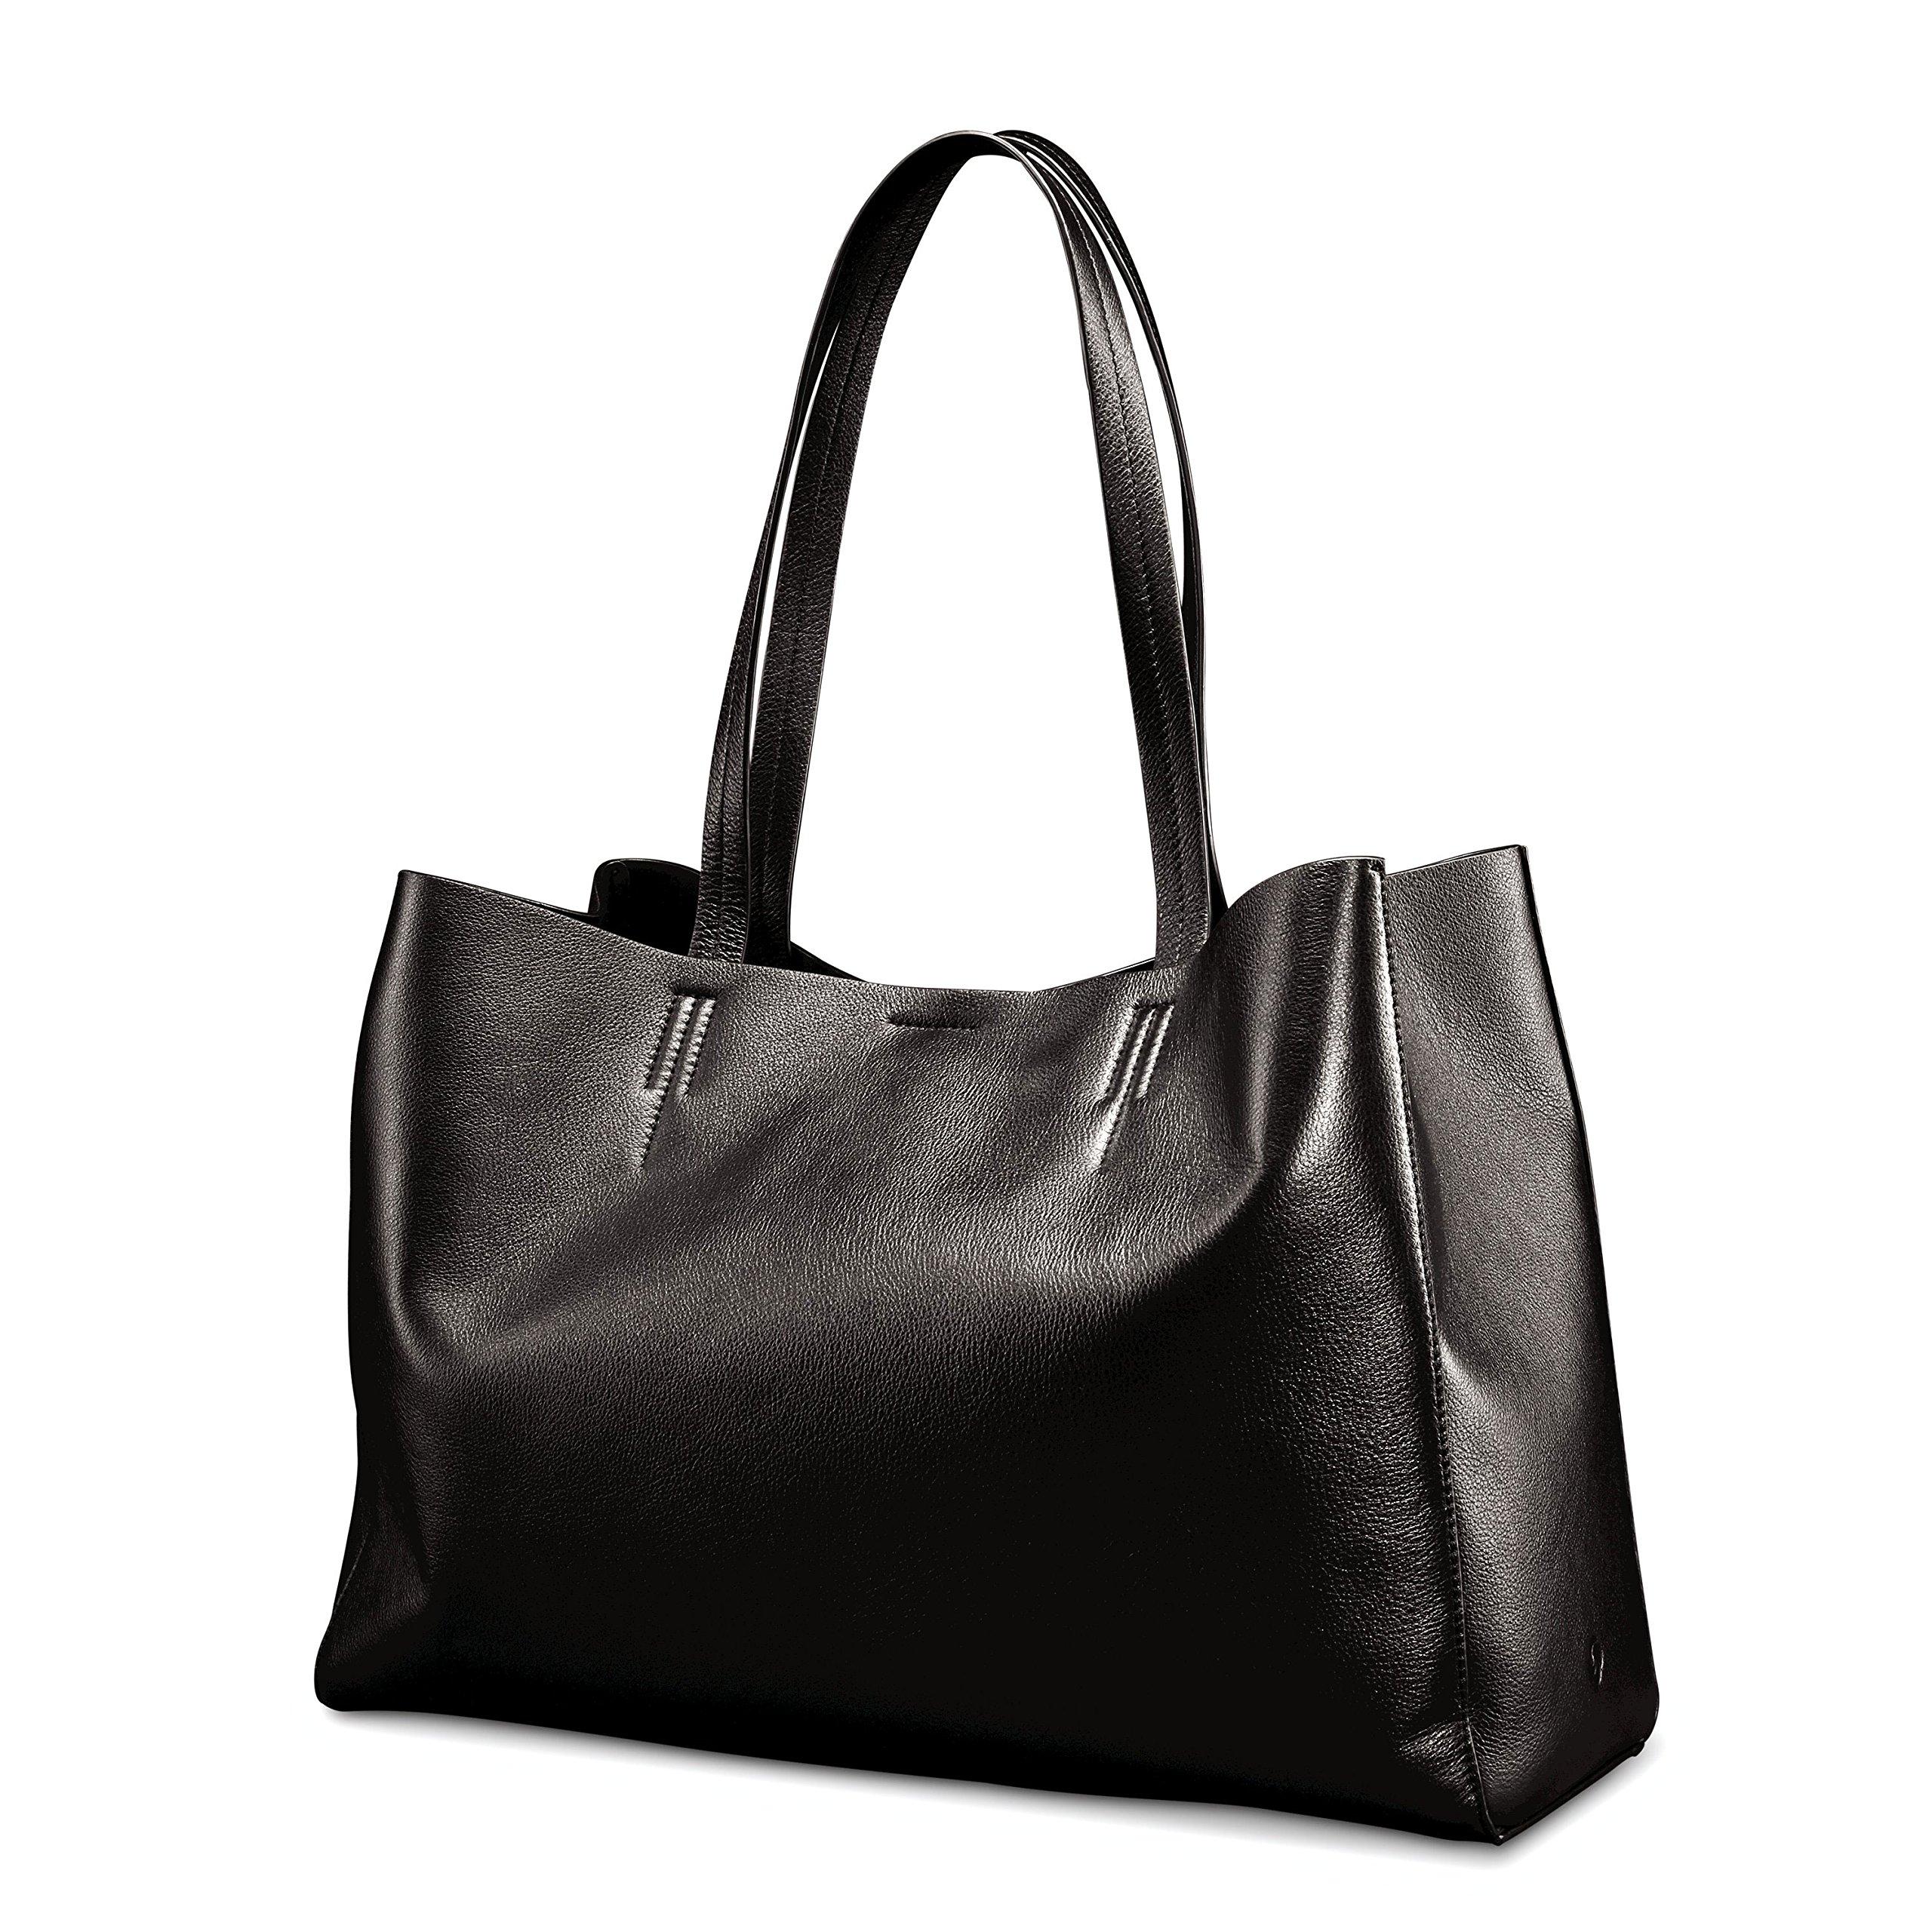 Samsonite Business Leather Tote Black by Samsonite